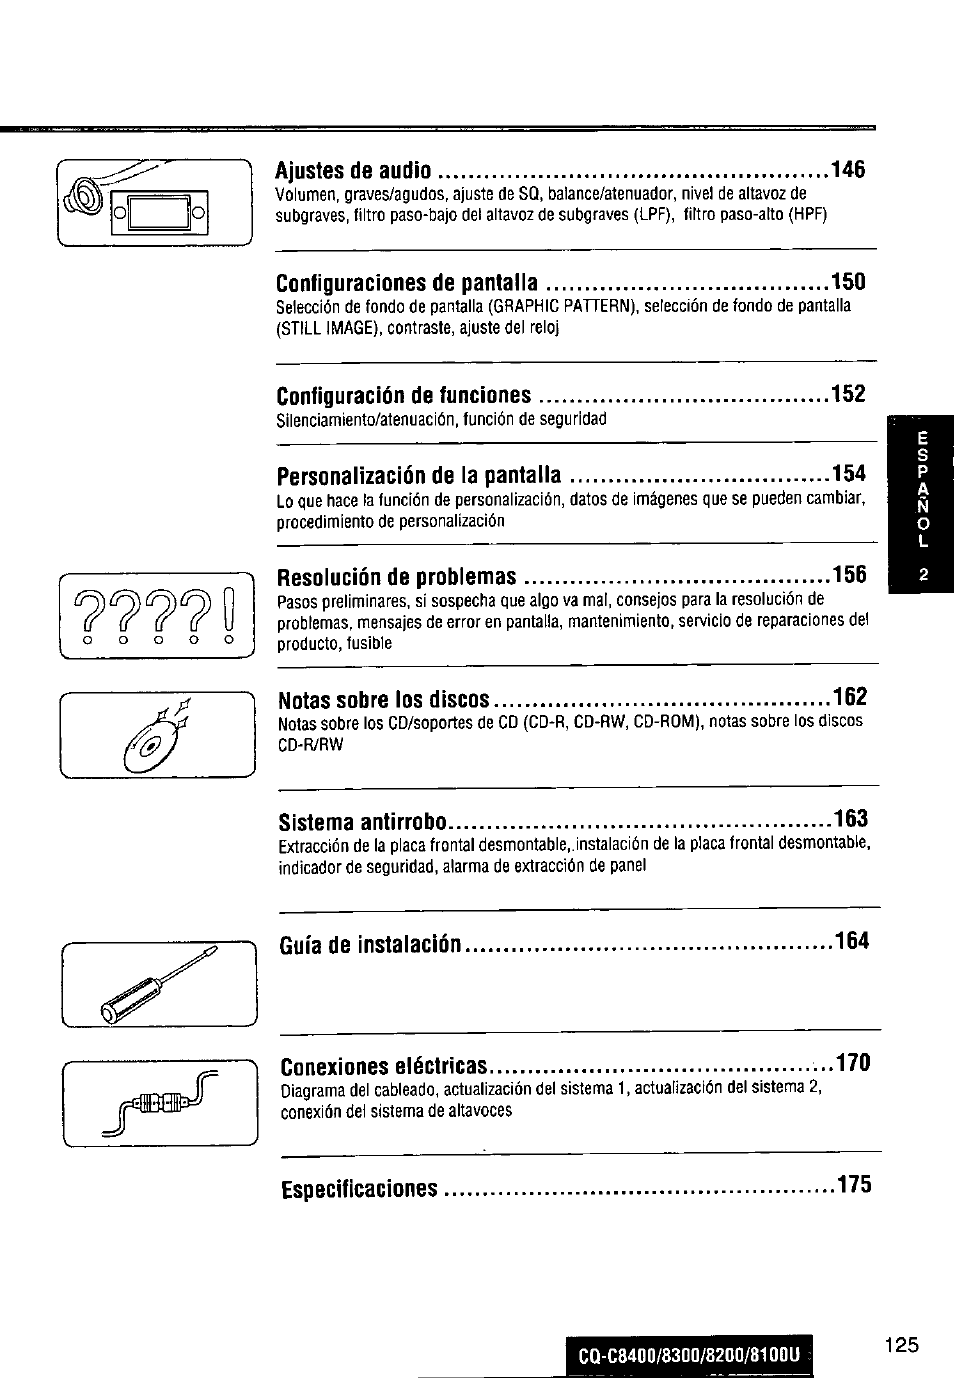 medium resolution of panasonic cq c8300u user manual page 125 176